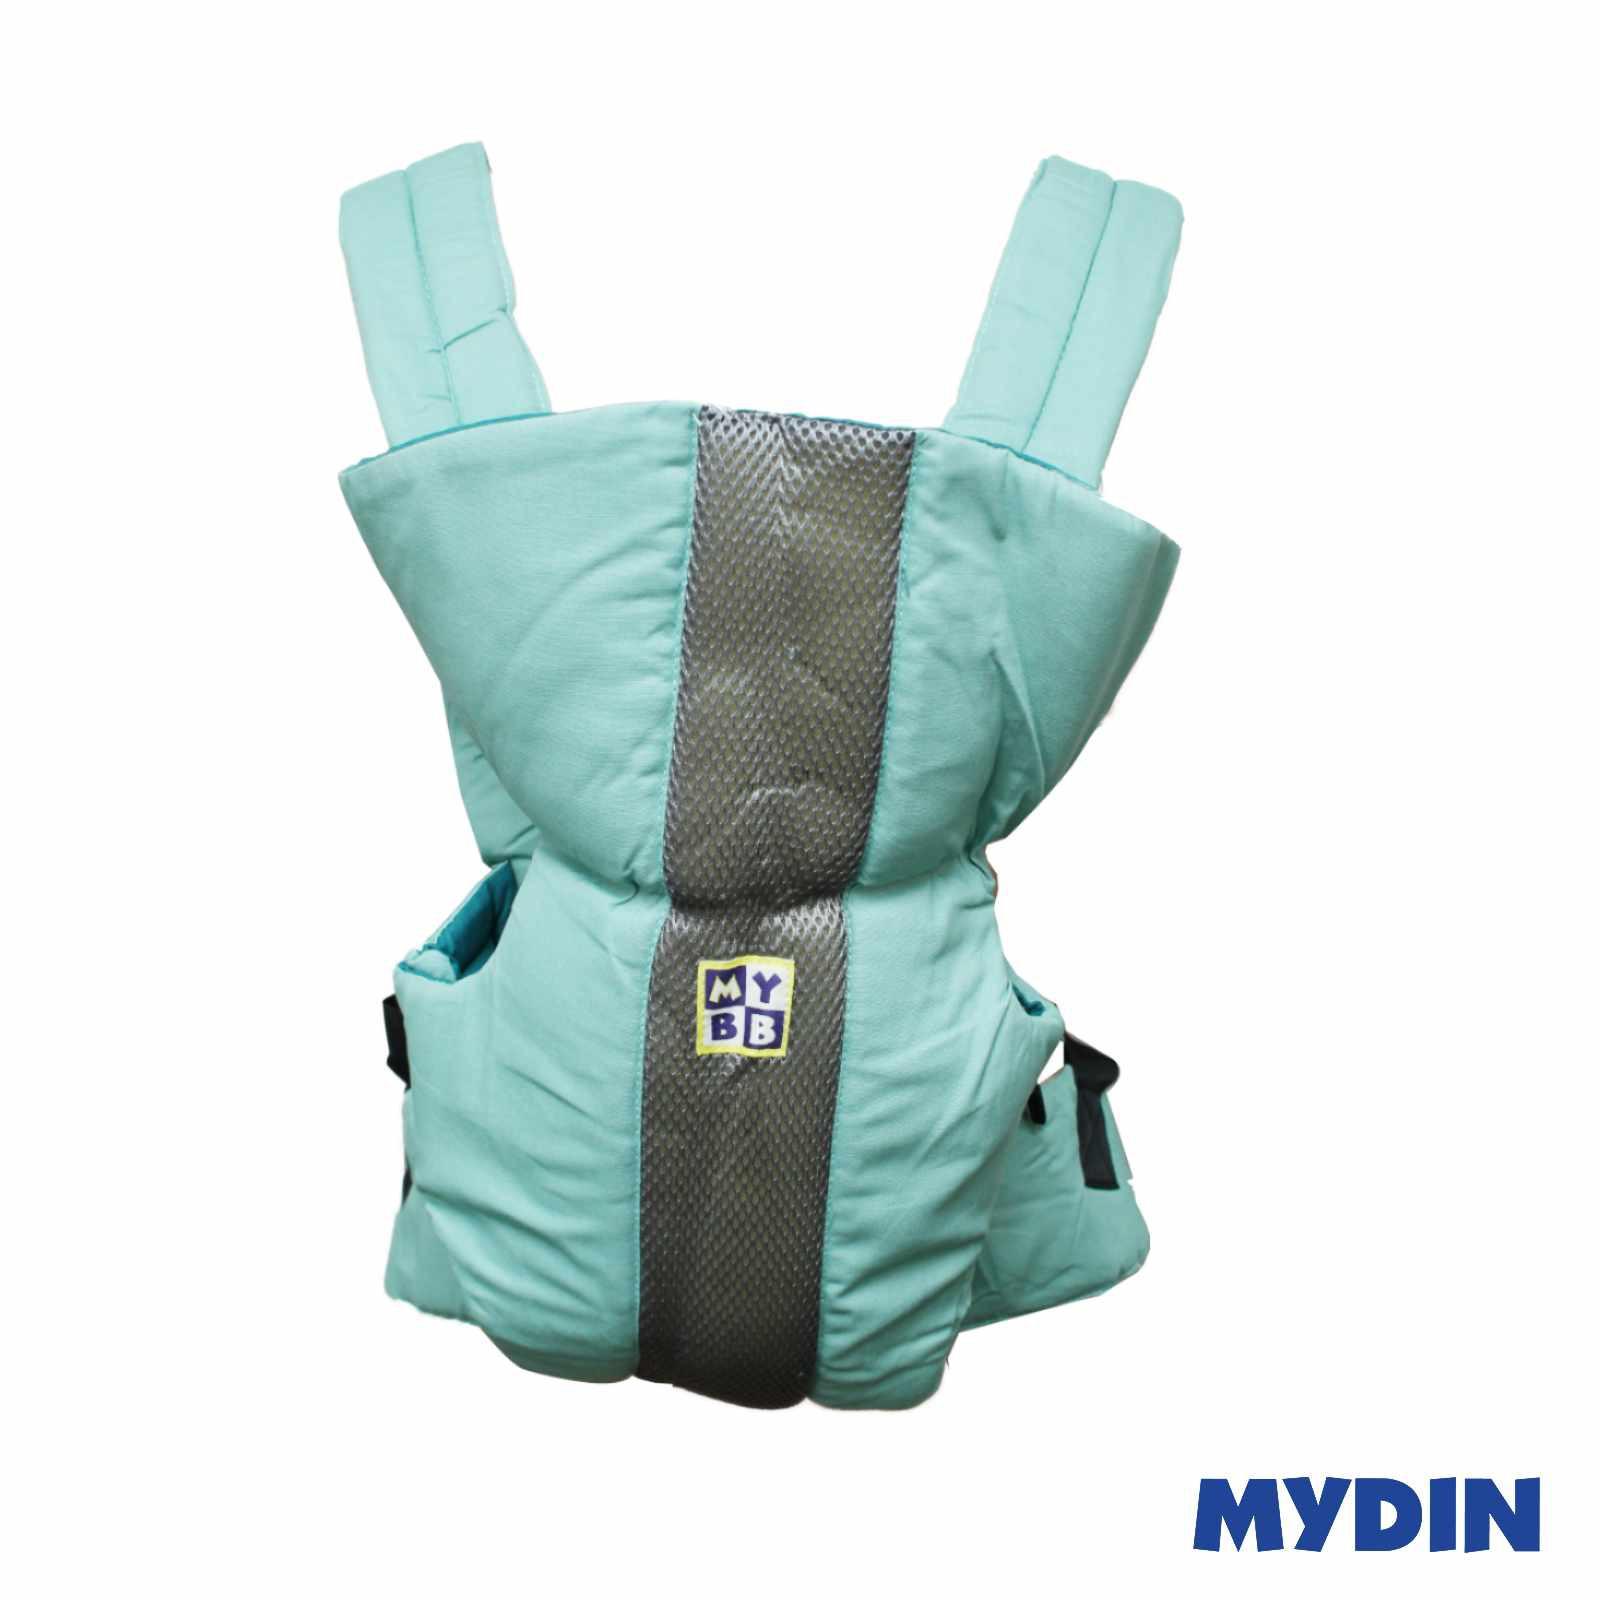 MYBB Baby Carrier 0319CBBDTN04